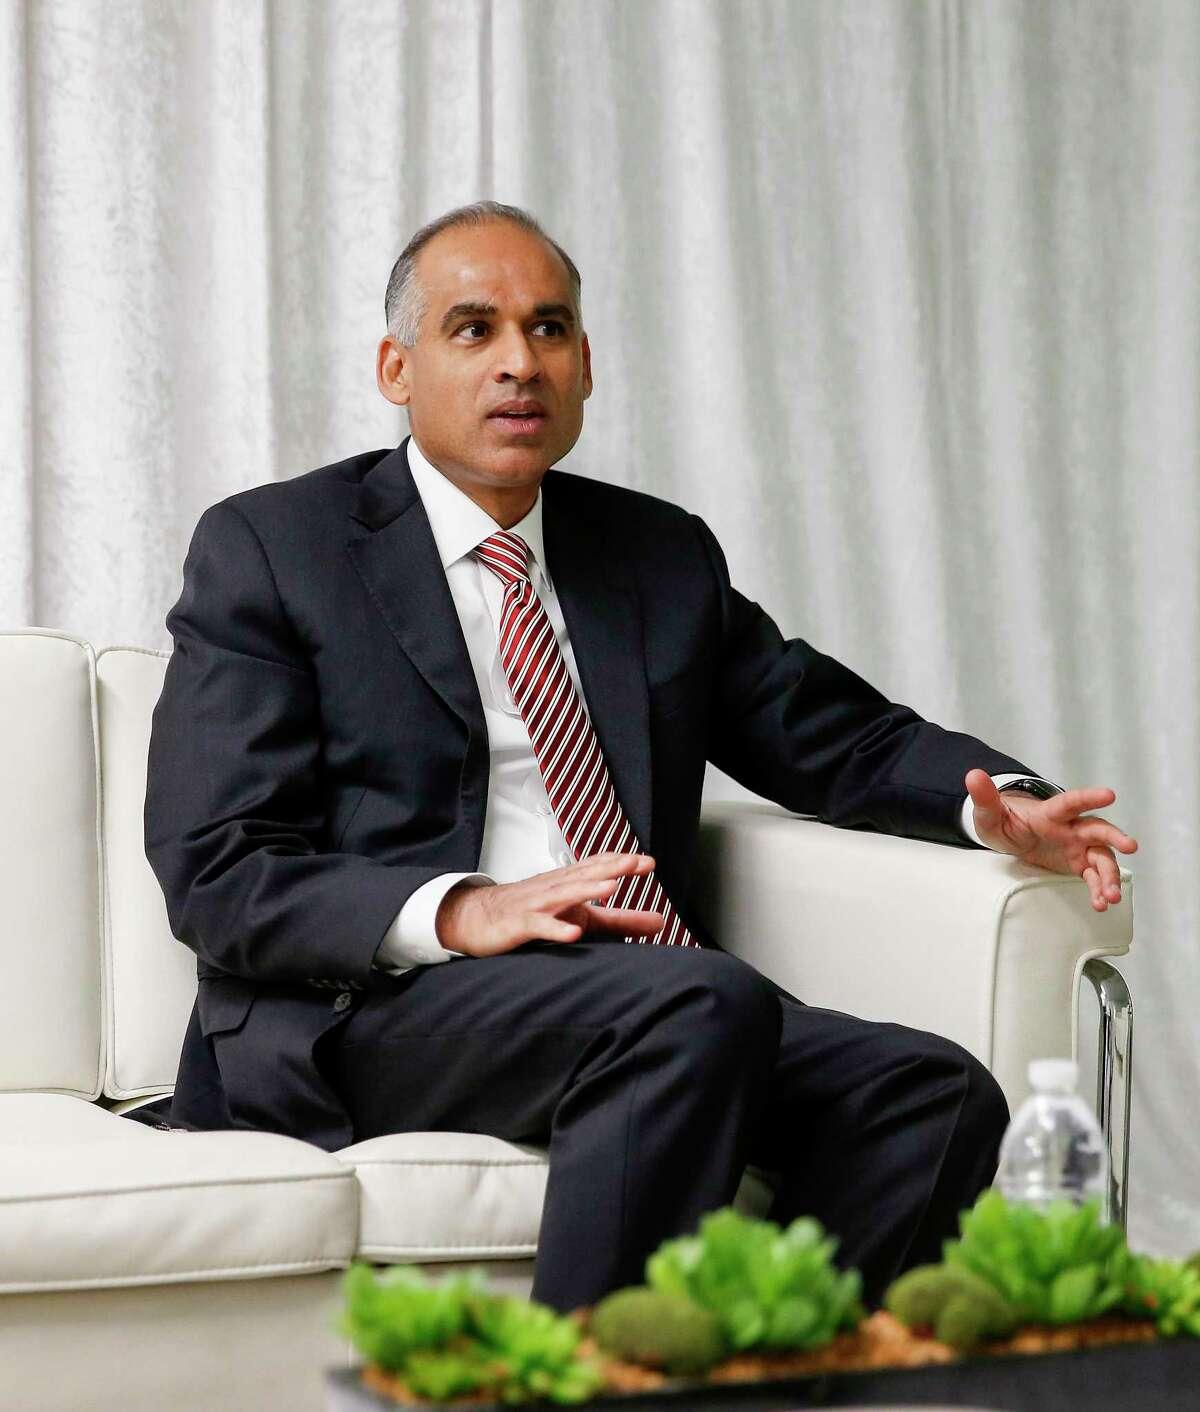 No. 9. Bob Patel, CEO of LyondellBasell.